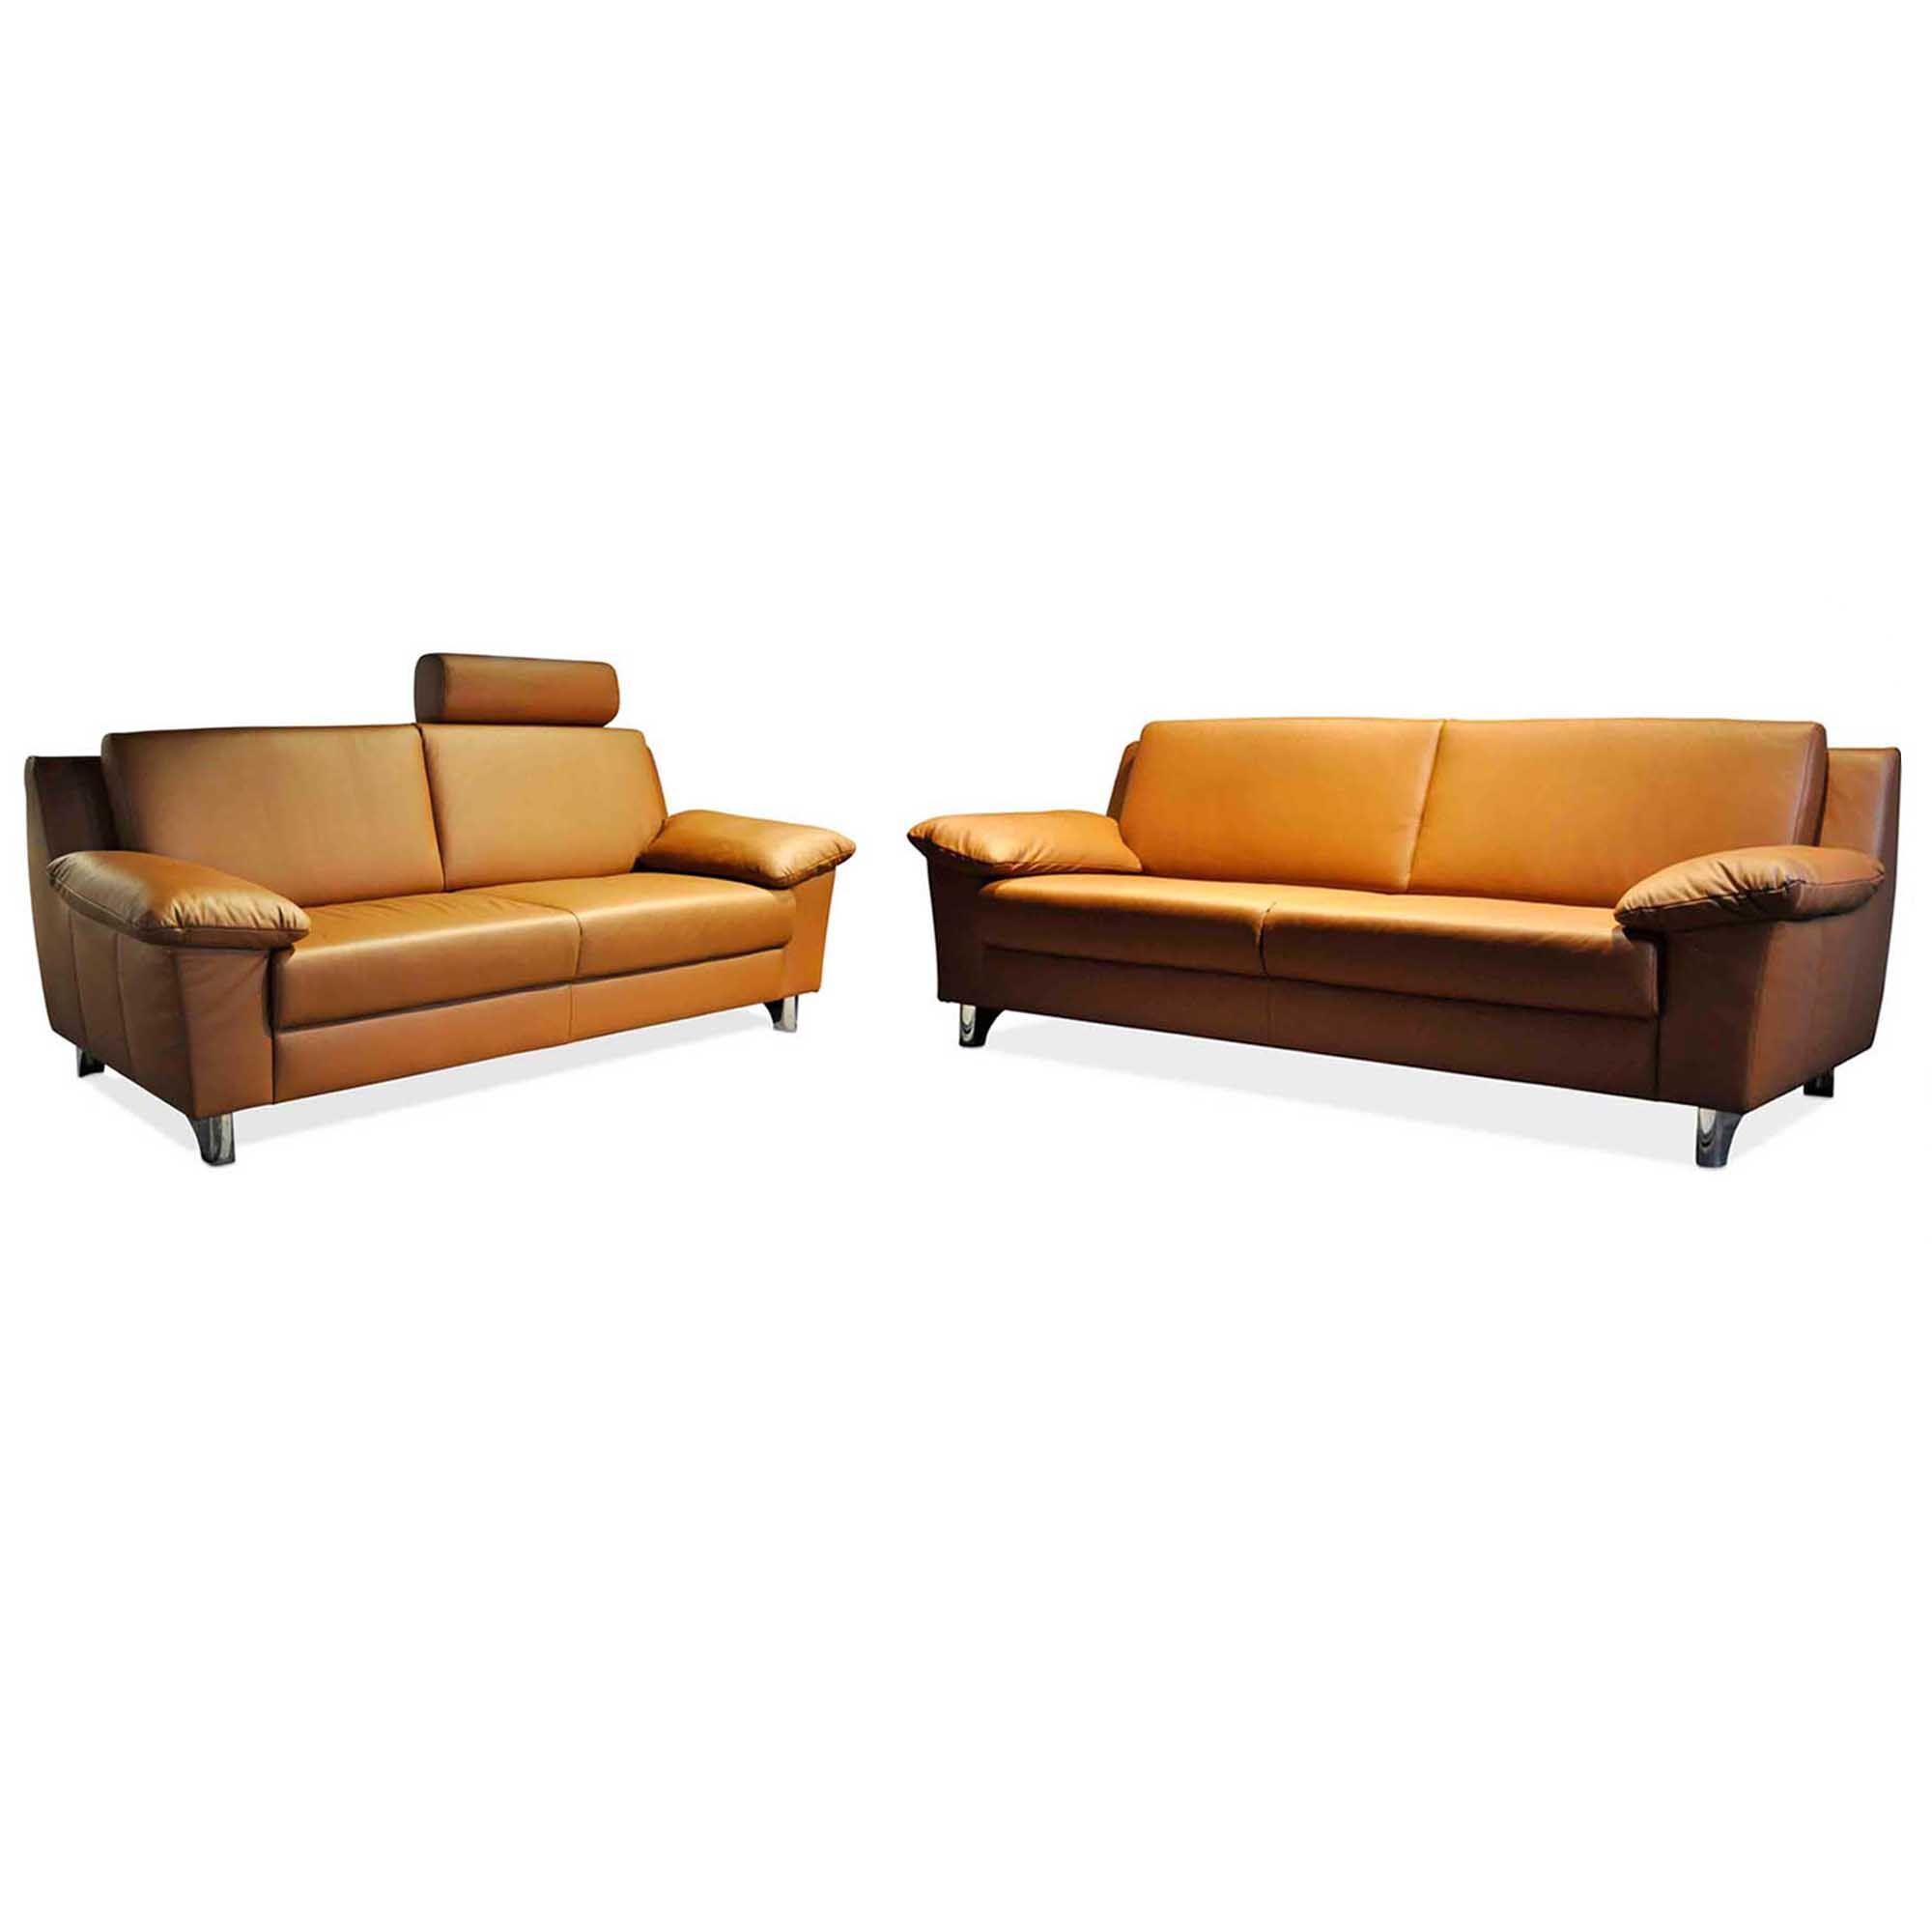 Garnitur El Paso (3-Sitzer, 2-Sitzer, Hocker) – E. Schillig – Sofas ...